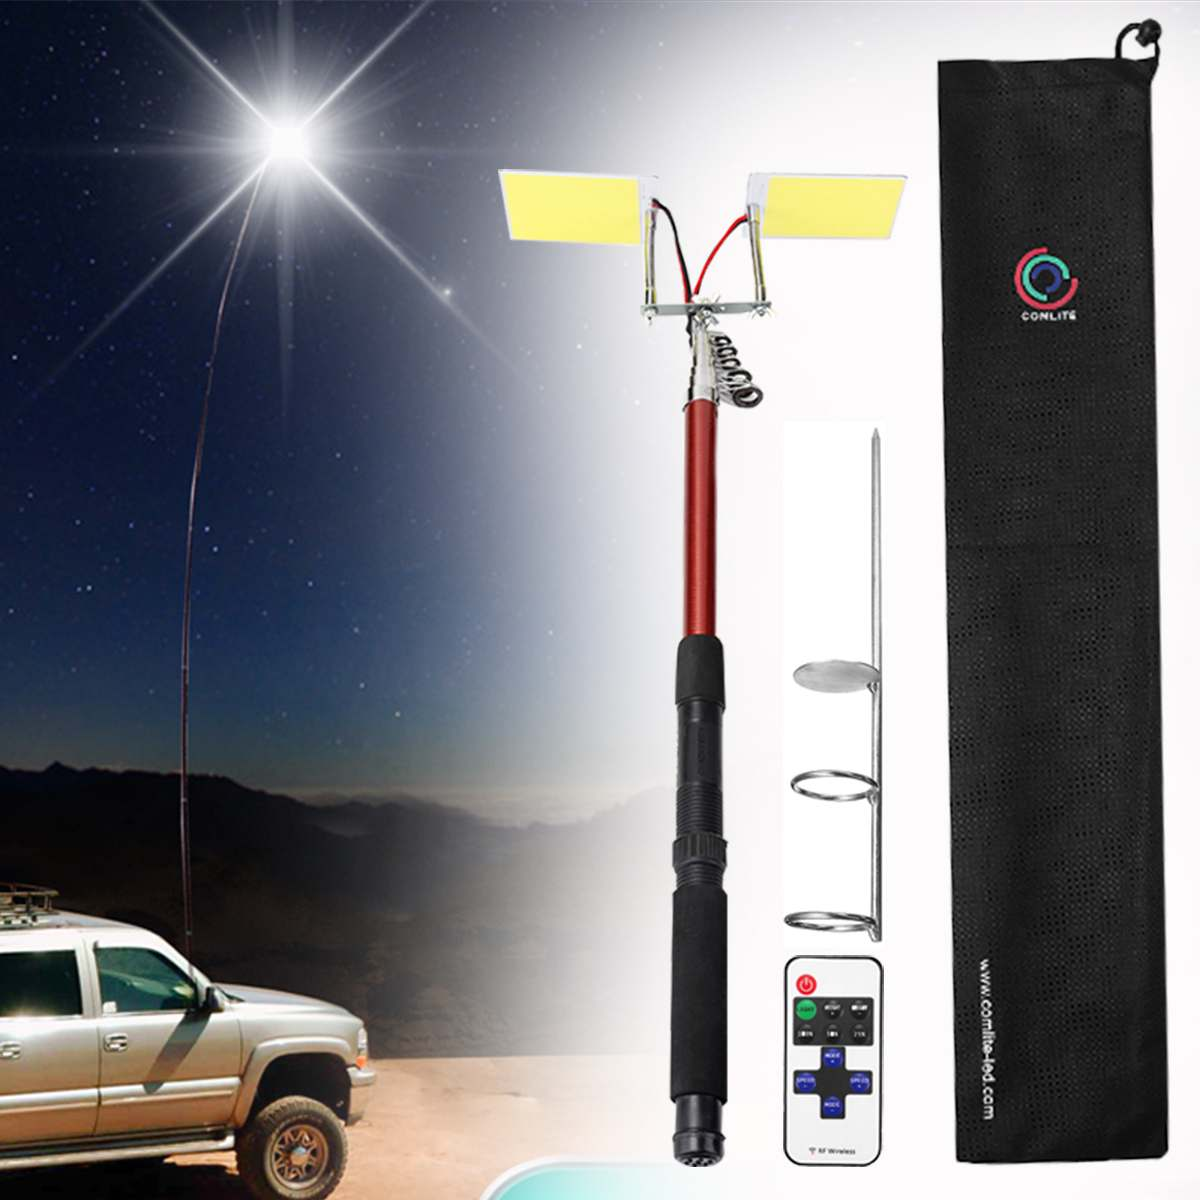 Light Lantern Telescopic Fishing-Rod Travel-Lamp Remote-Control Outdoor Camping 12V LED